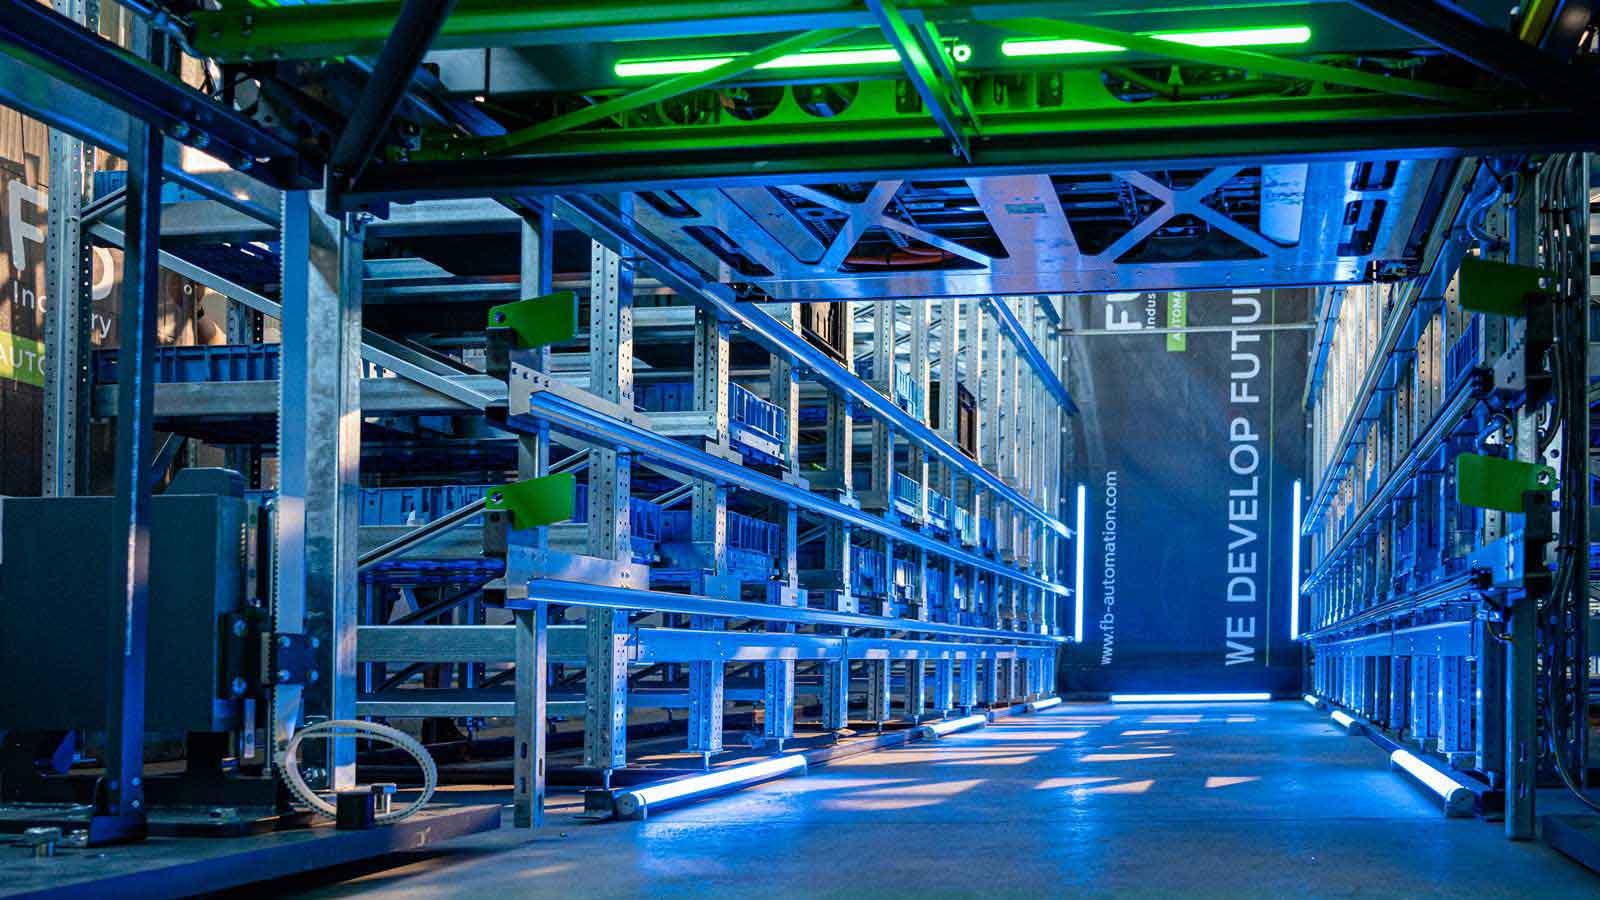 fb-intralogistik-shuttles-wir-entwickeln-zukunft-fb-industry-automation